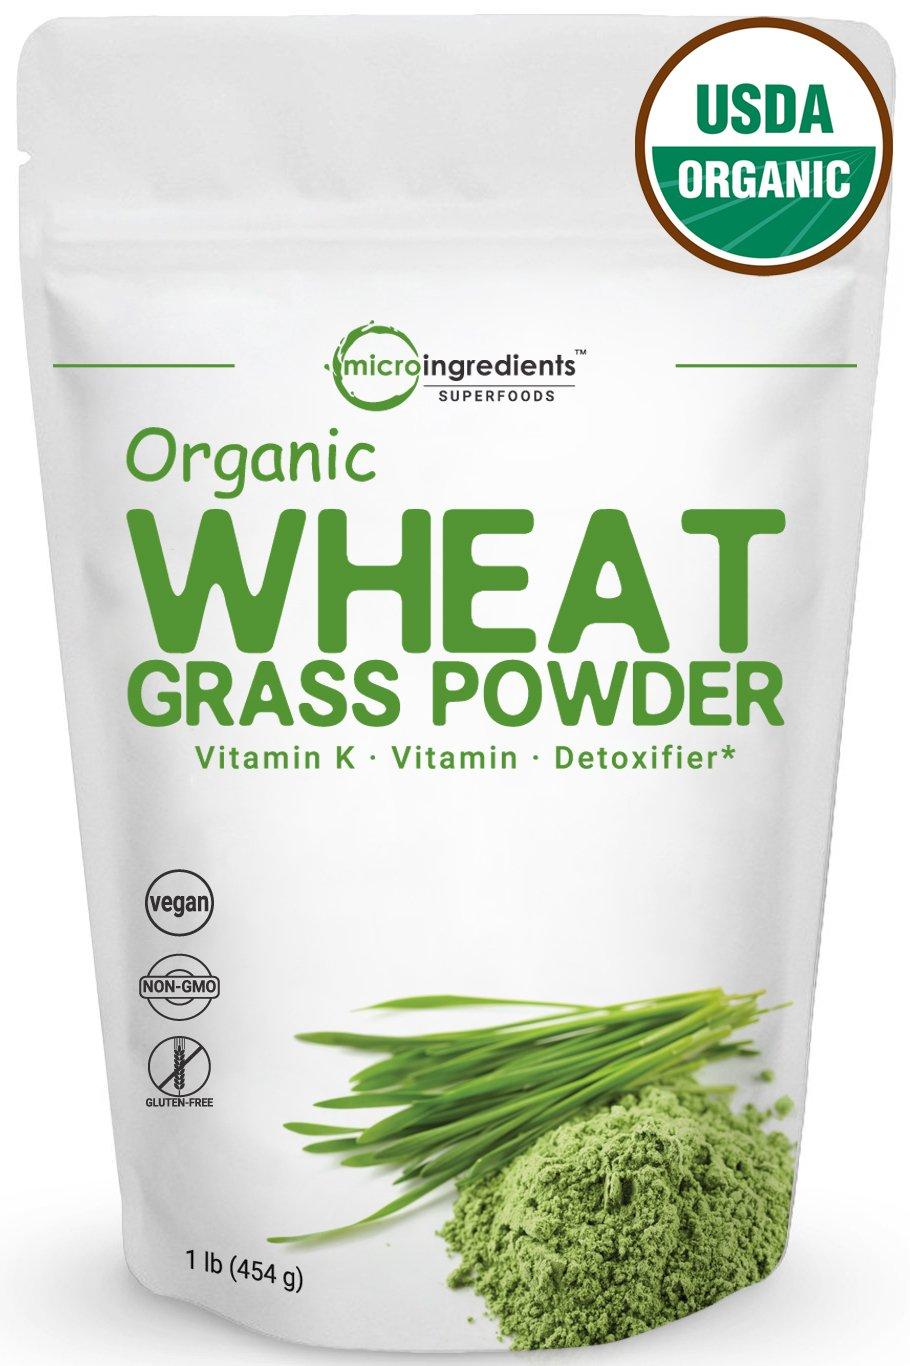 Sustainably US Grown, Organic Wheat Grass Powder, 150 Serving (1 Pound), Rich Fiber, Chlorophyll, Antioxidants, Essential Amino Acids, Fatty Acids, Minerals & Vitamins. Best Vegan & Non-GMO SuperFoods by Micro Ingredients